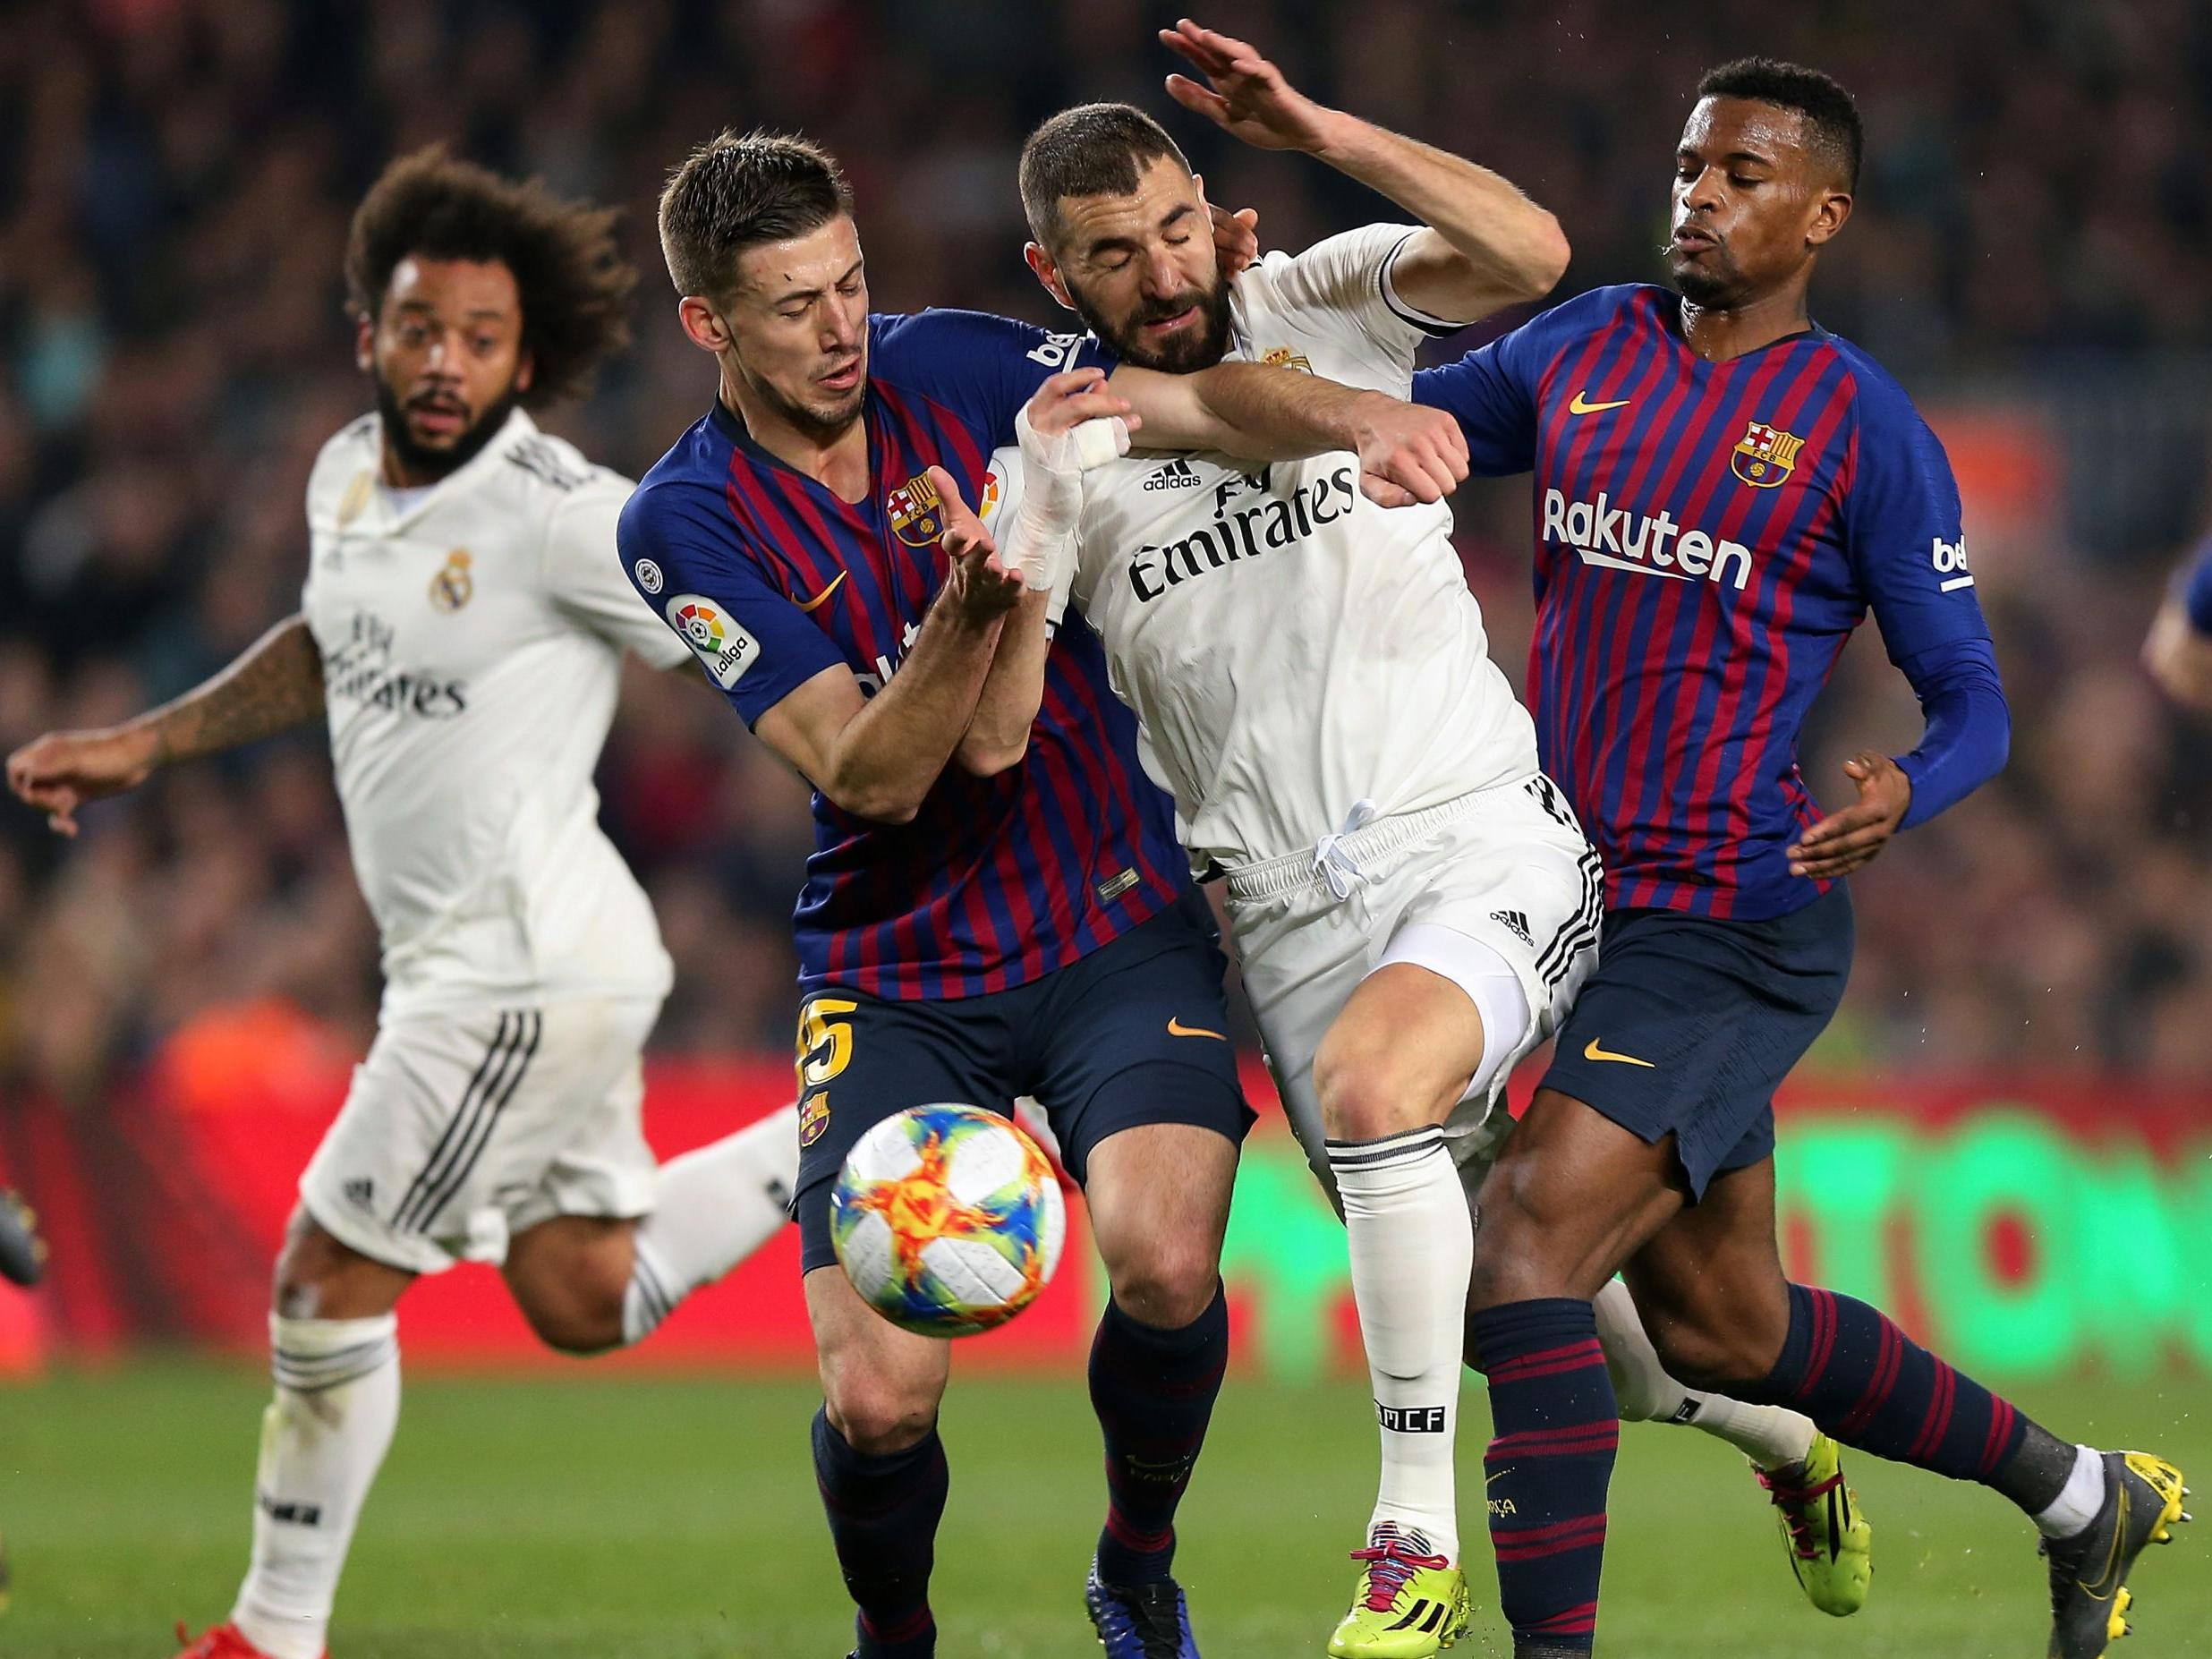 835fbda59a8e5 Spanish FA in talks over £150m deal to take Super Cup to Saudi Arabia